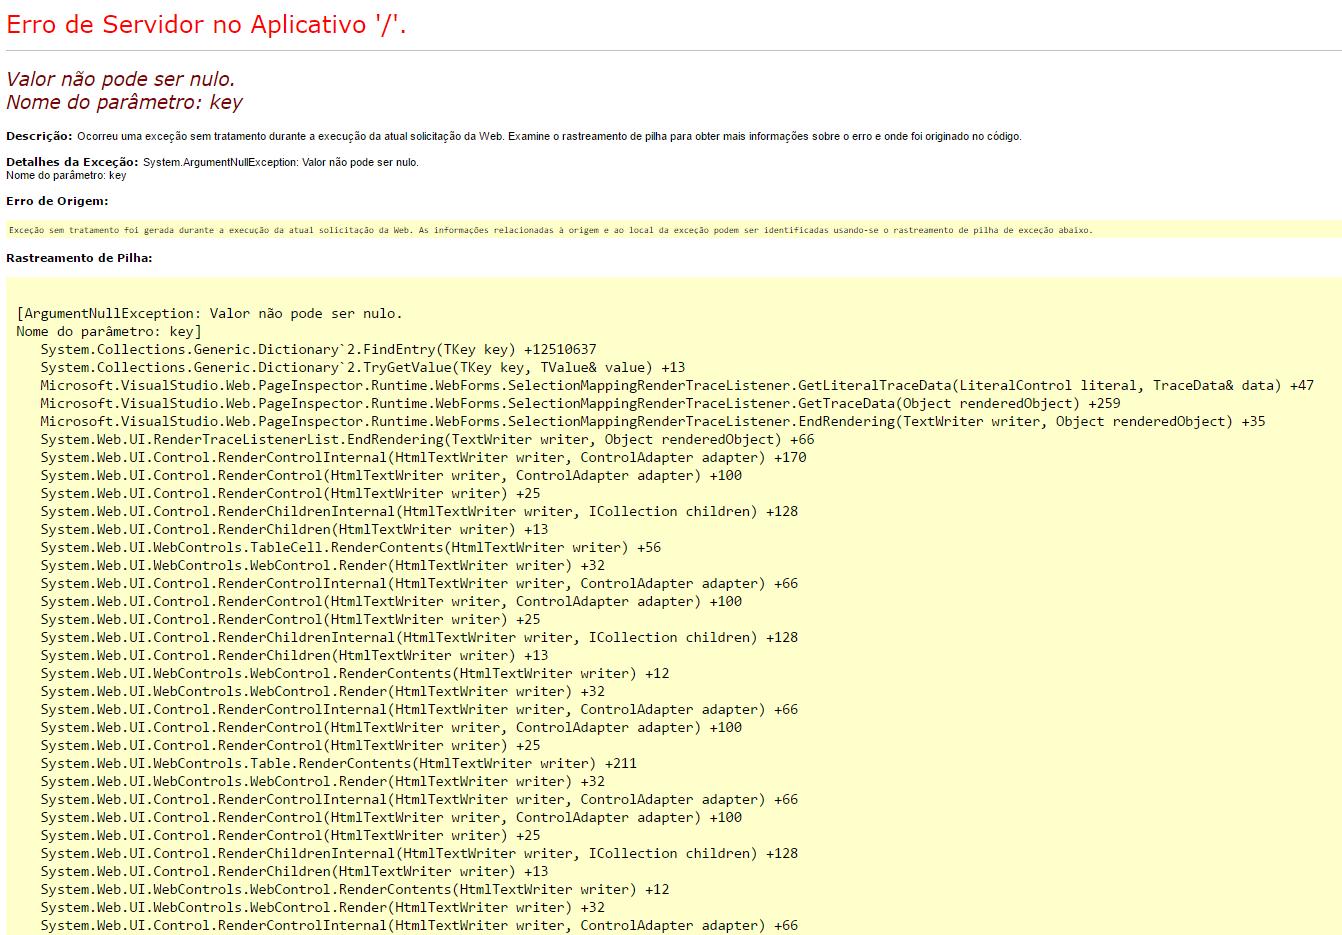 Erro de servidor no Aplicativo